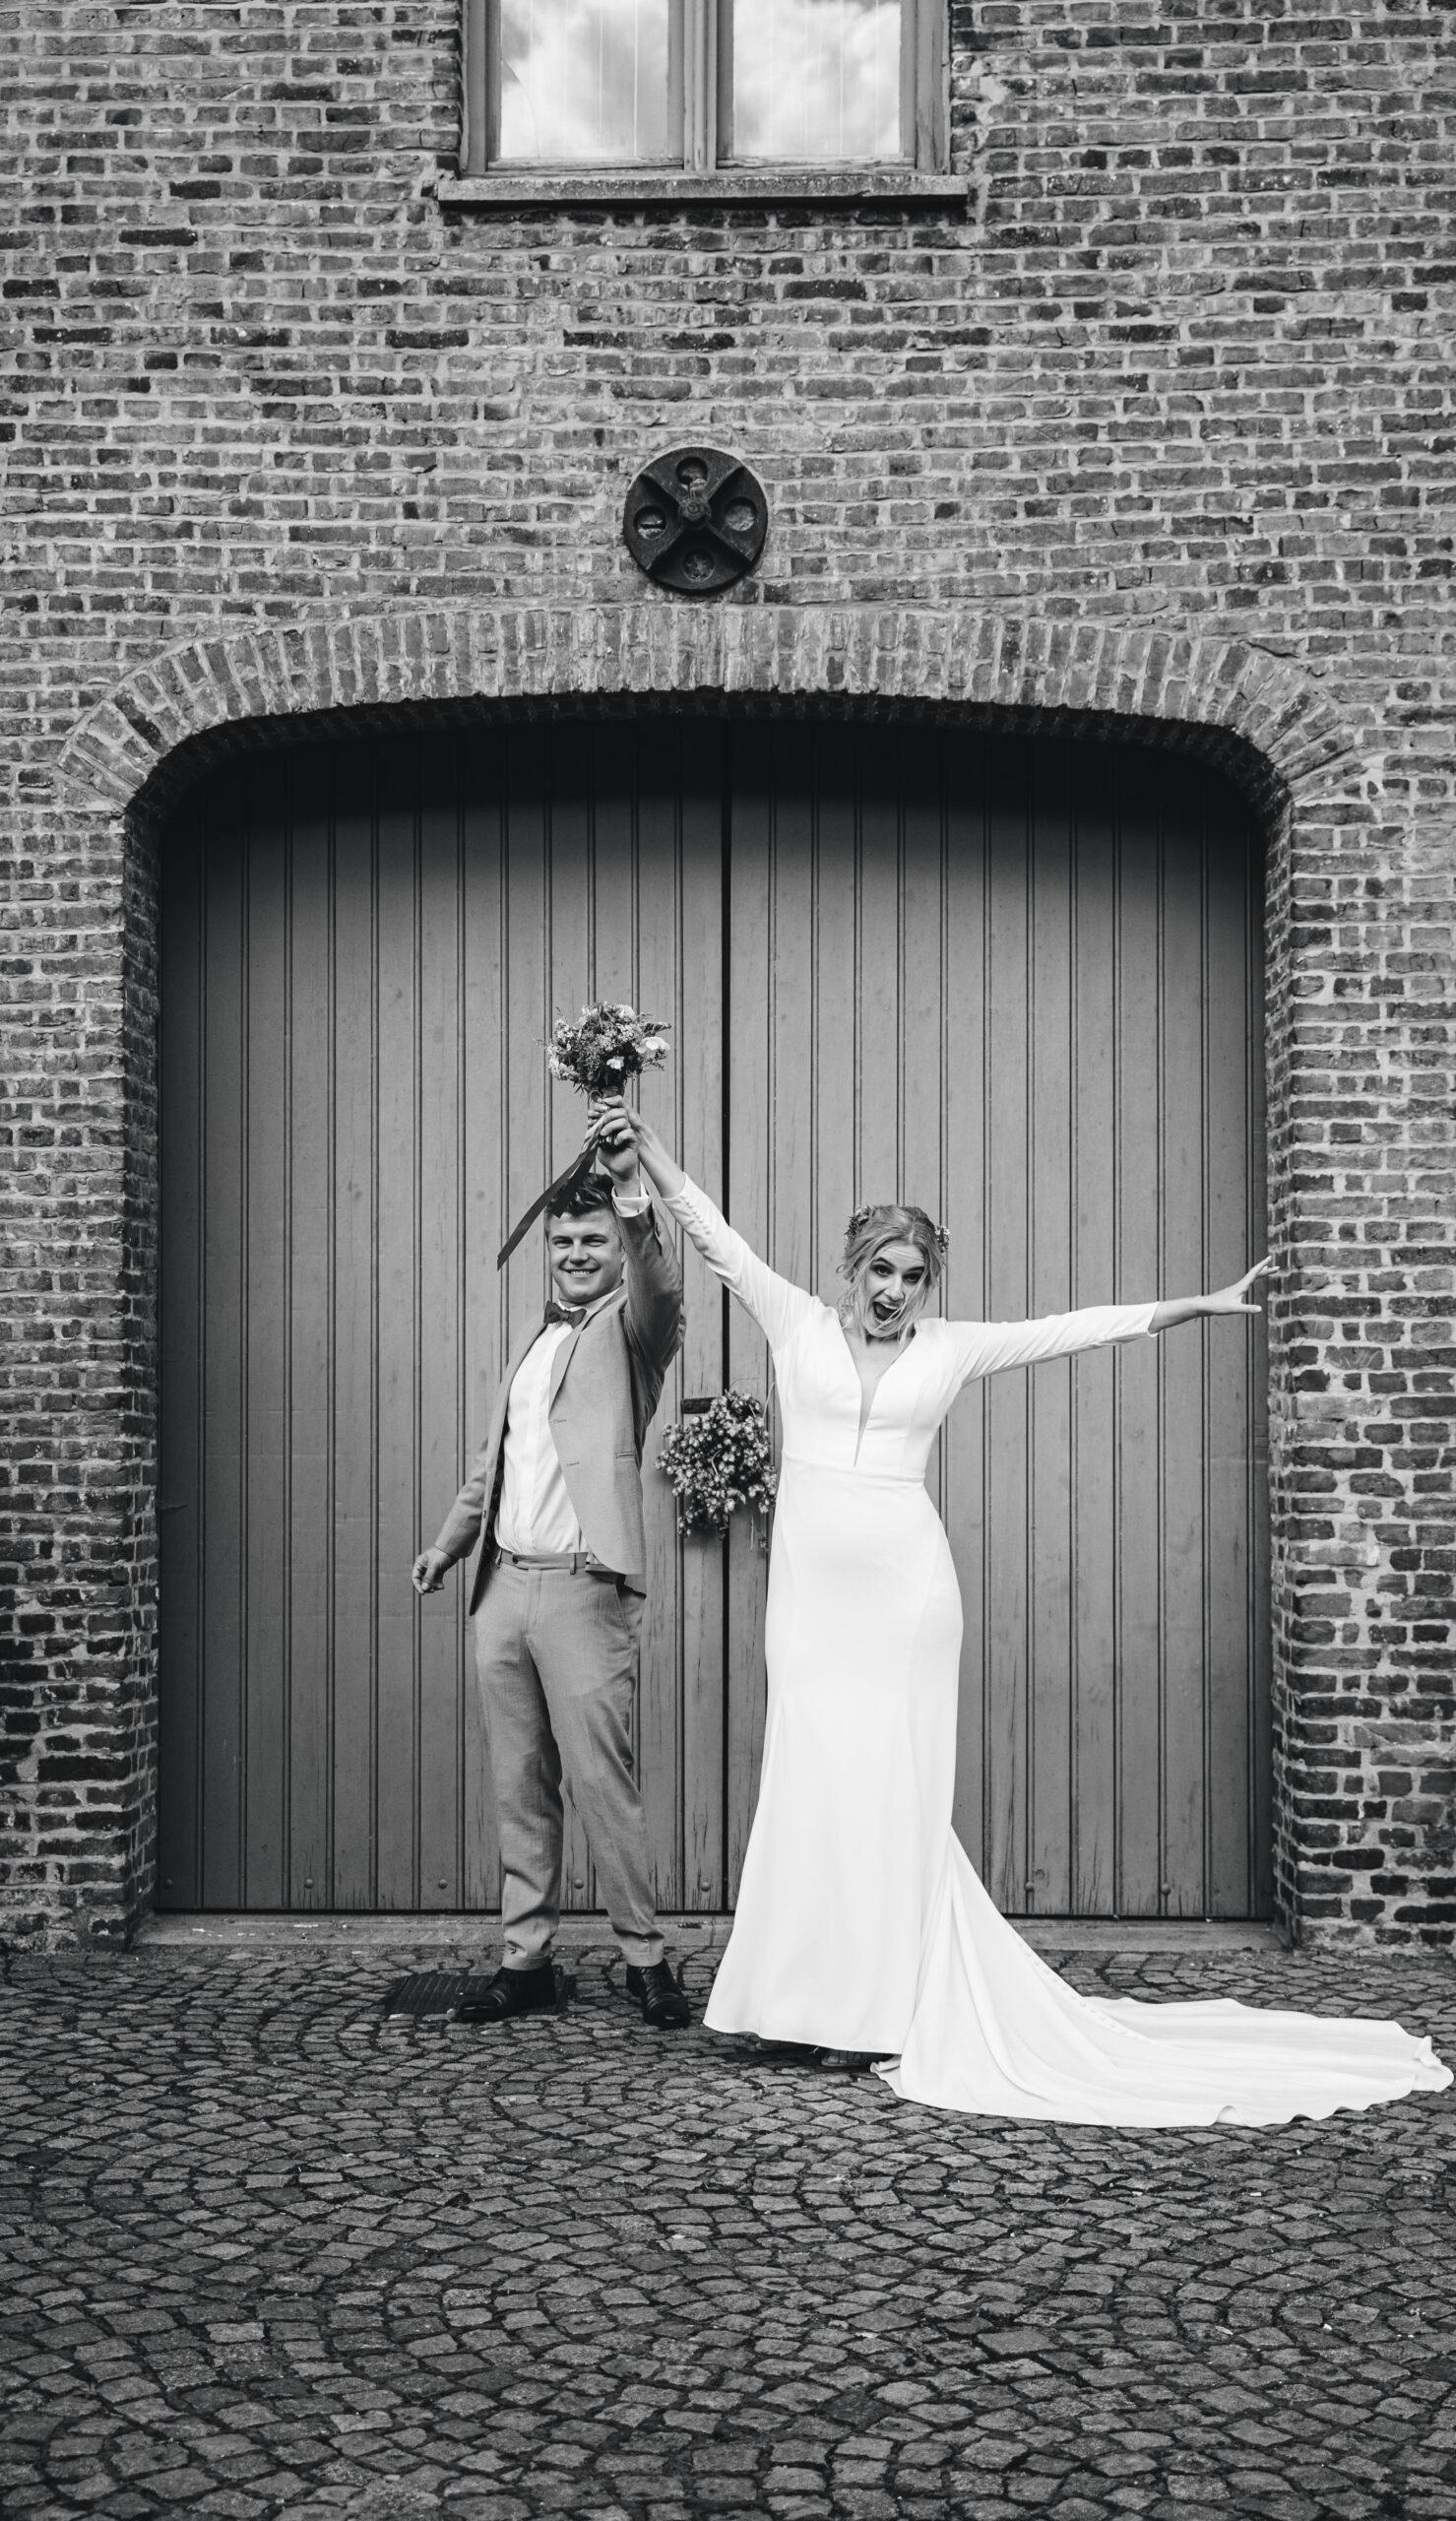 Studio Volt - Ciska Callens - Ieper - fotografie, foodfotografie, productfotografie, studiofotografie, trouwfotografie, wedding